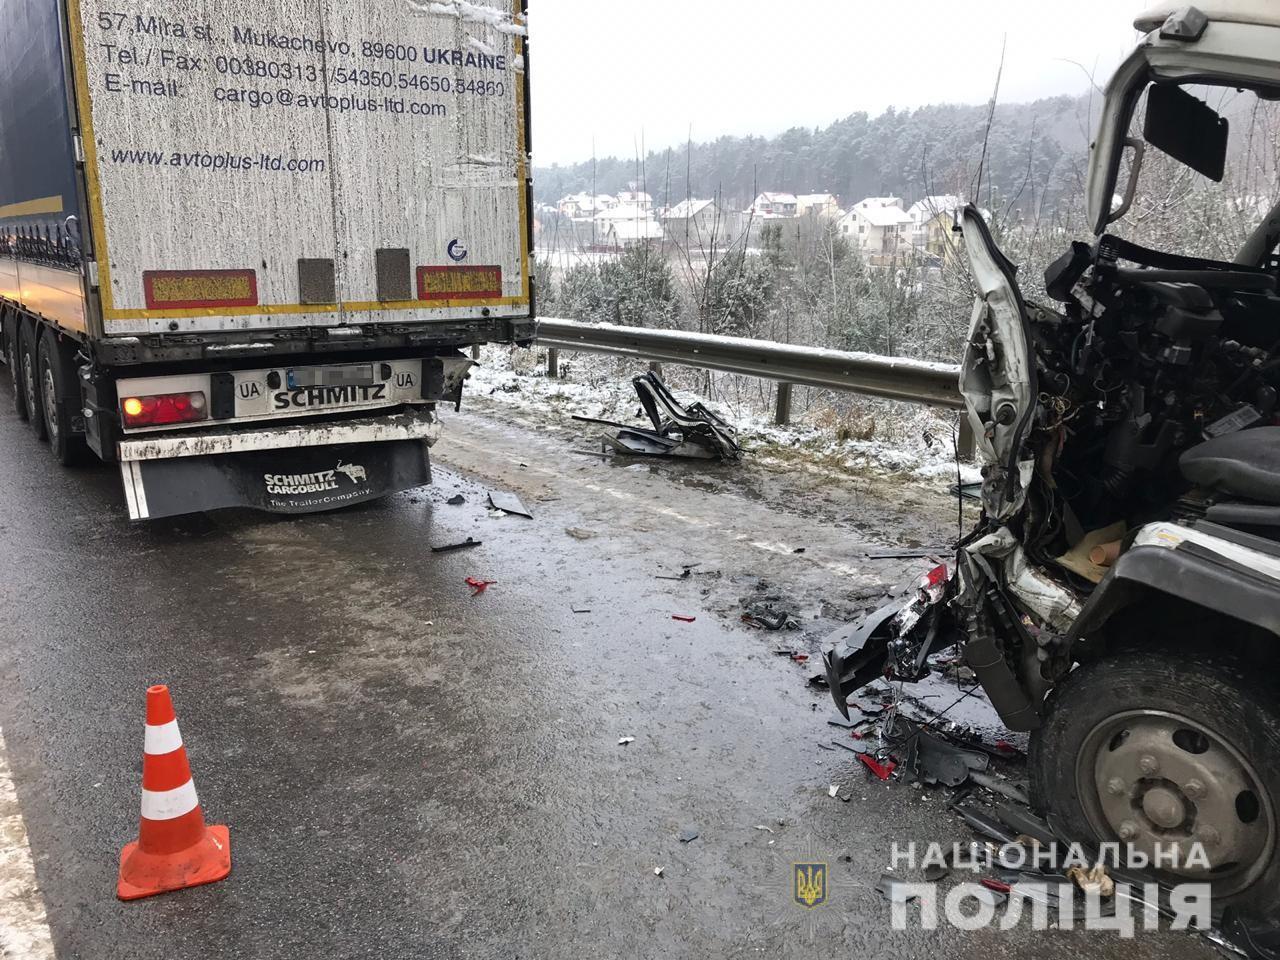 Закарпатець на вантажівці потрапив у аварію в Львівській області